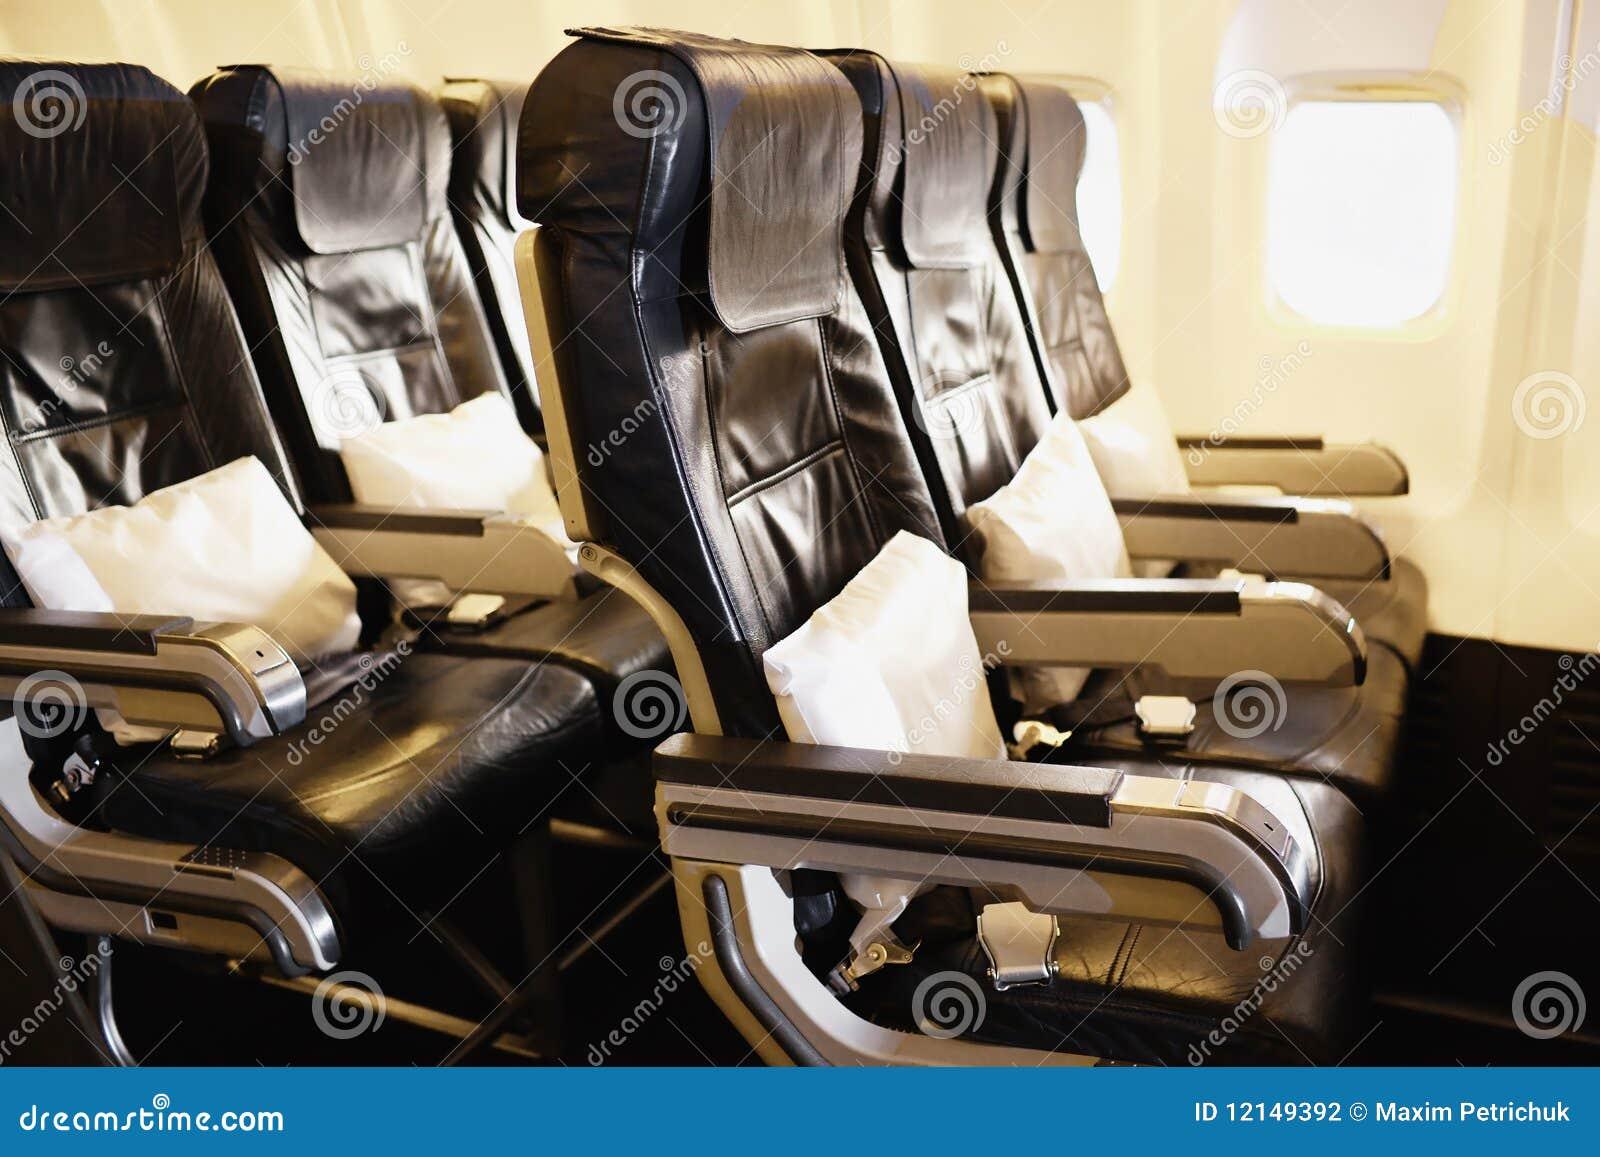 Aeroplano adentro